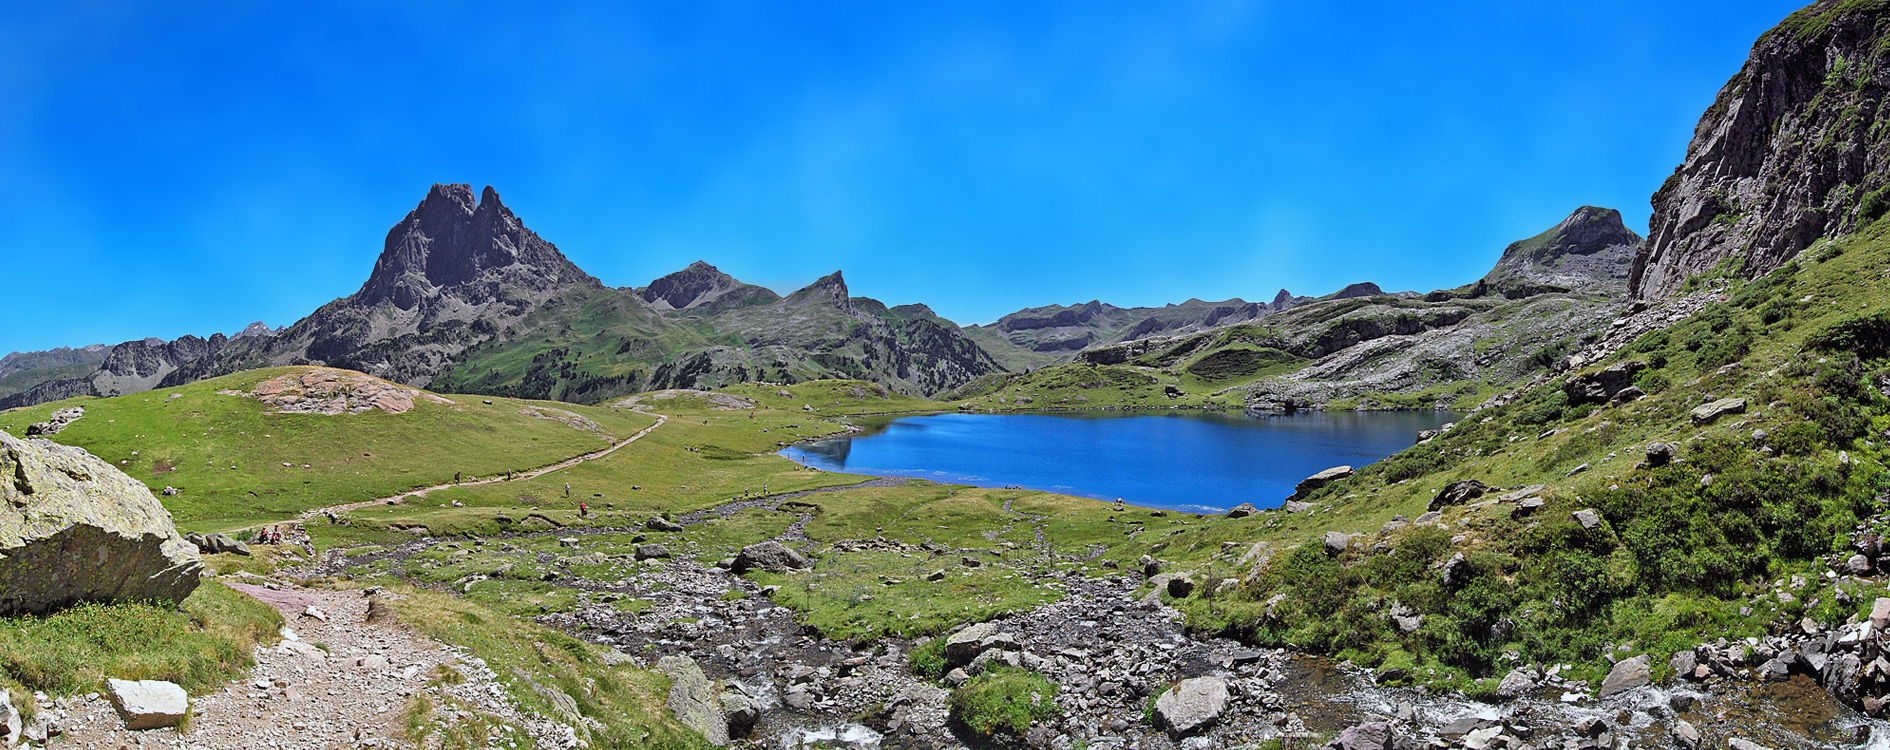 Pic du Midi d'Ossau. Source: . Credit: Guimir .